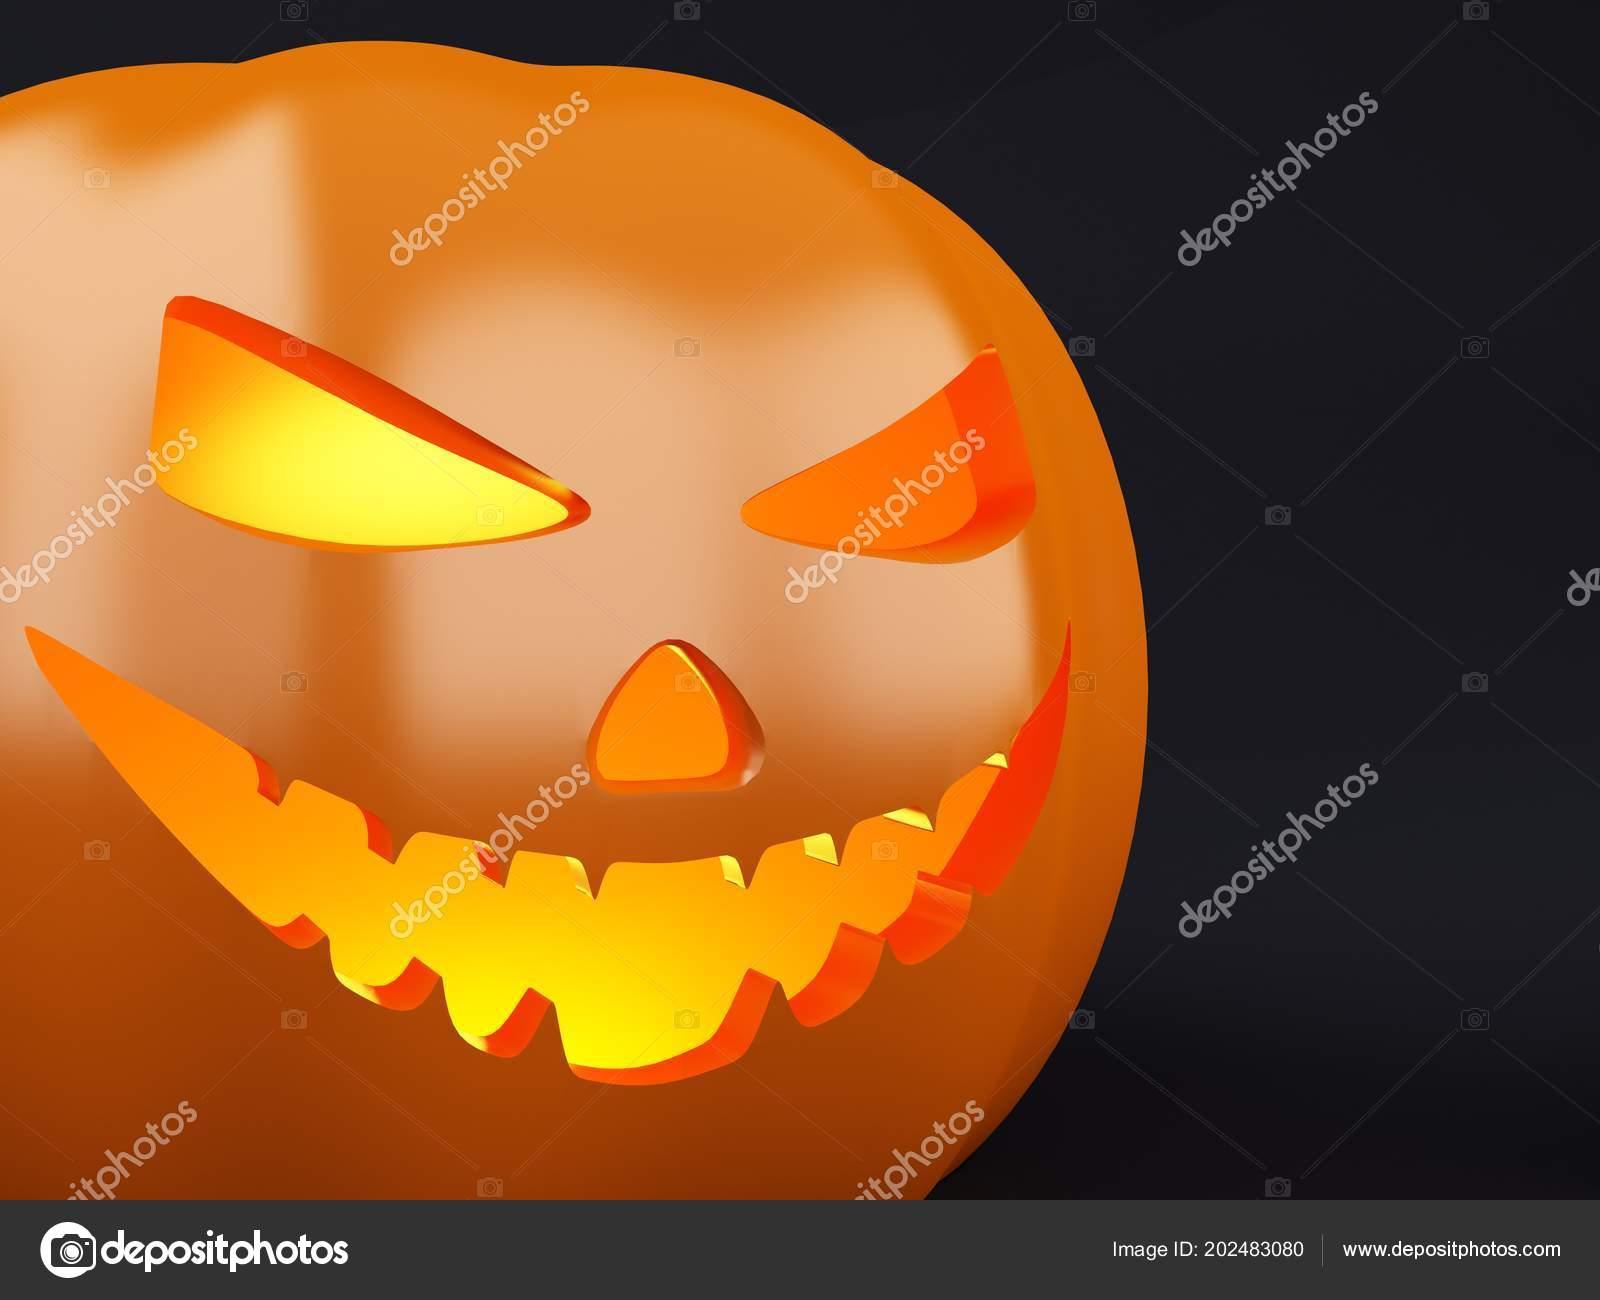 Illustration Happy Halloween Pumpkin Candle Light Hat Yellow Background Stock Photo C Nicomenijes 202483080